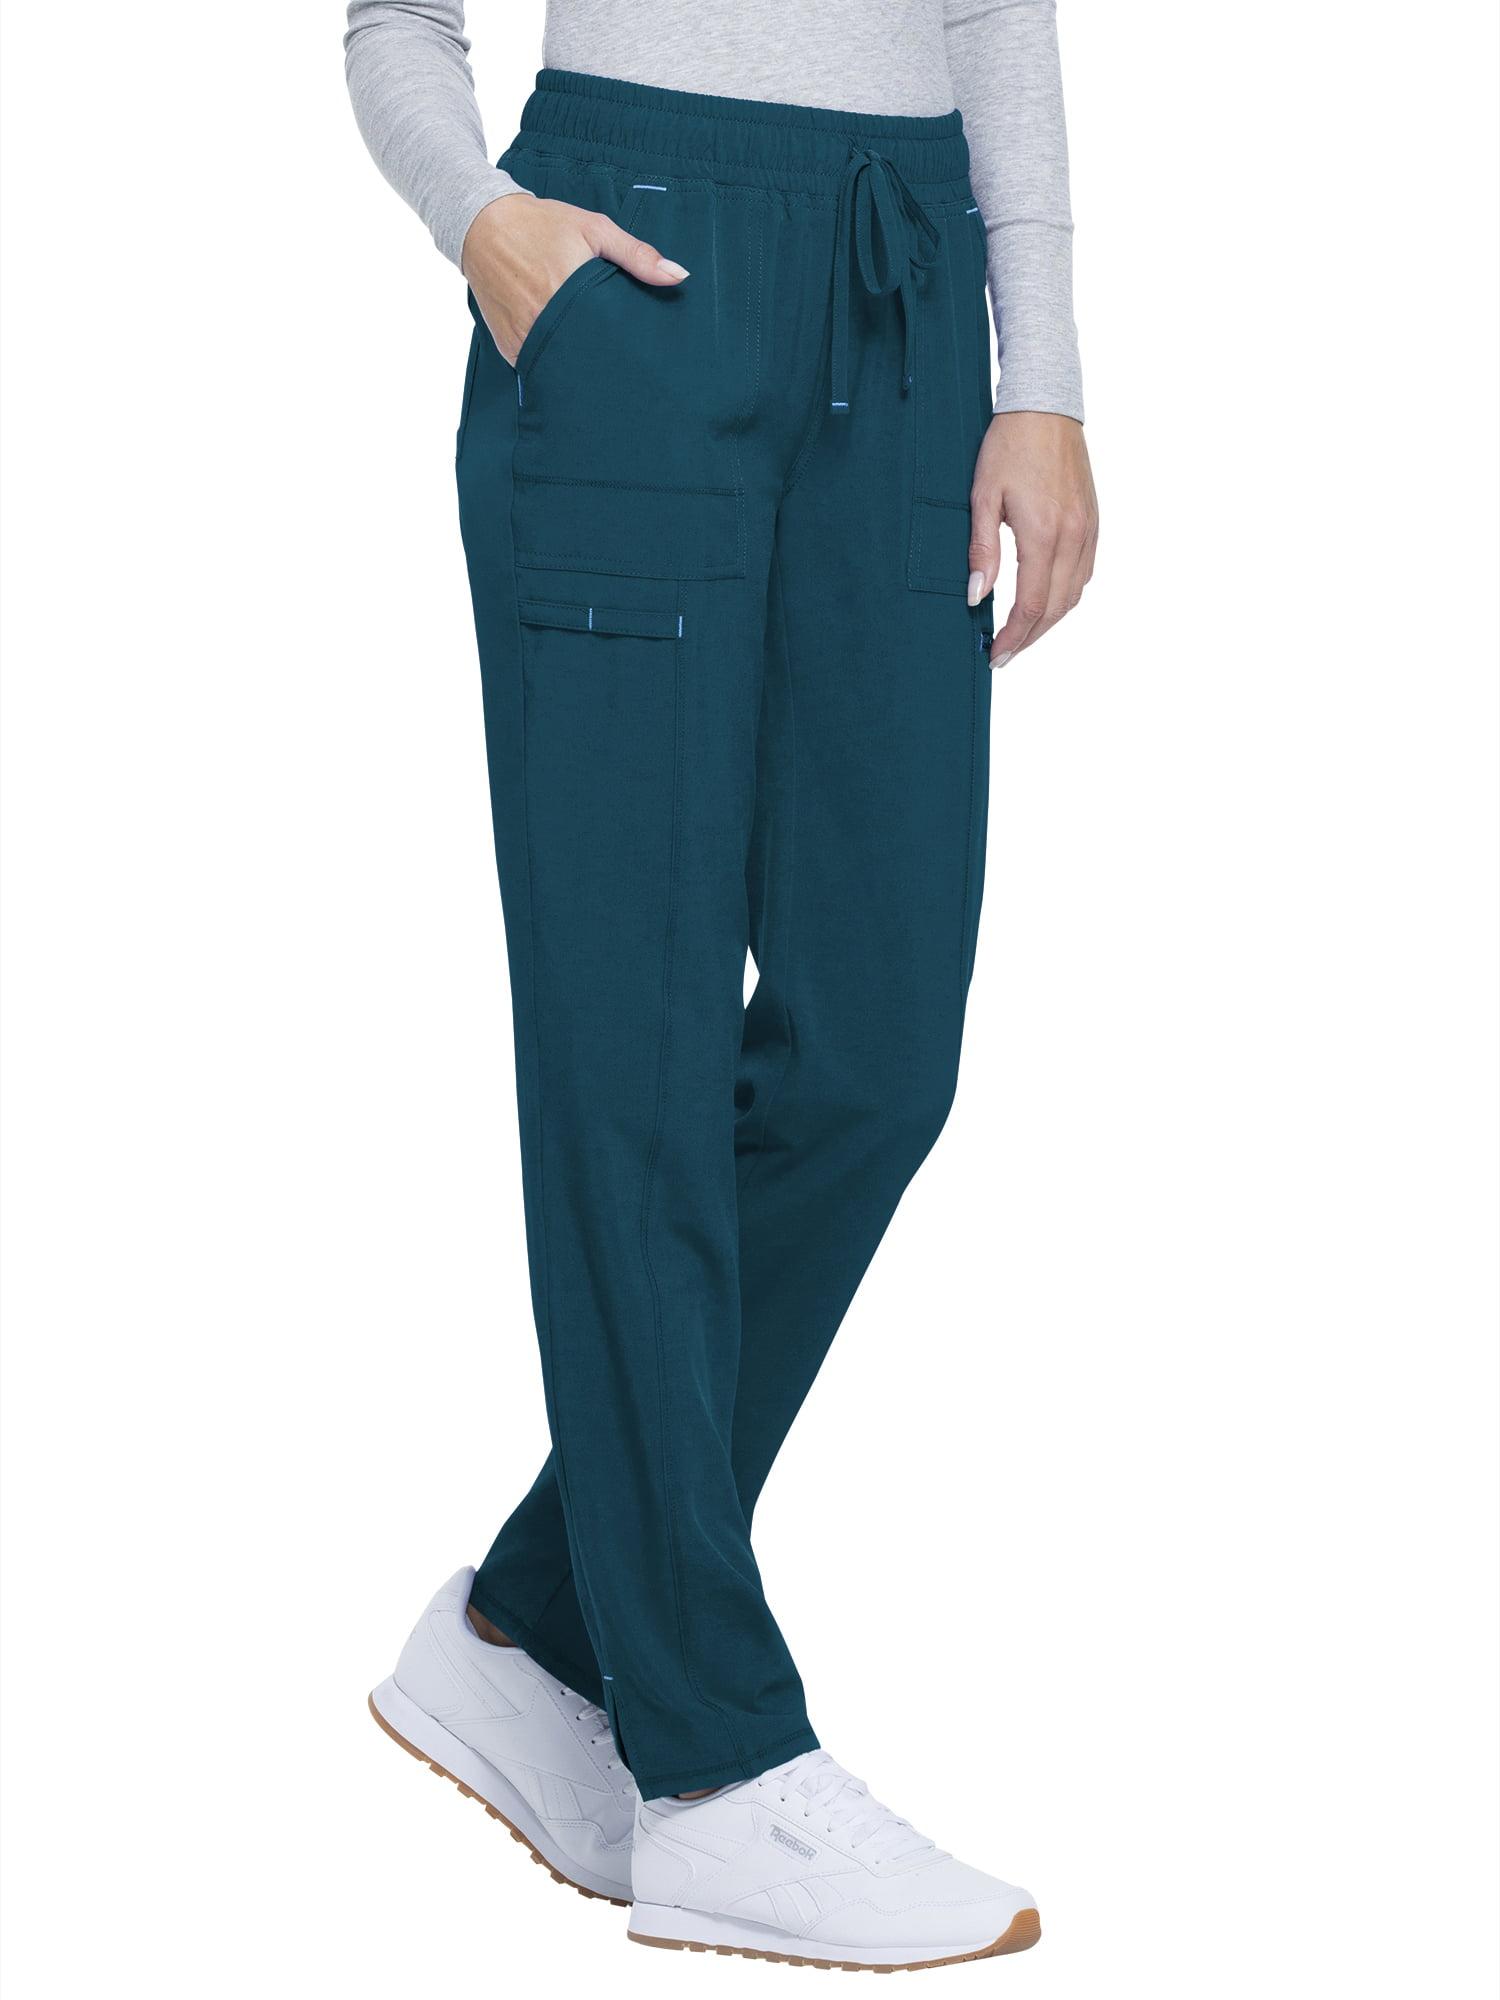 Scrubstar Women/'s Fashion Premium Performance Yoga Scrub Pants